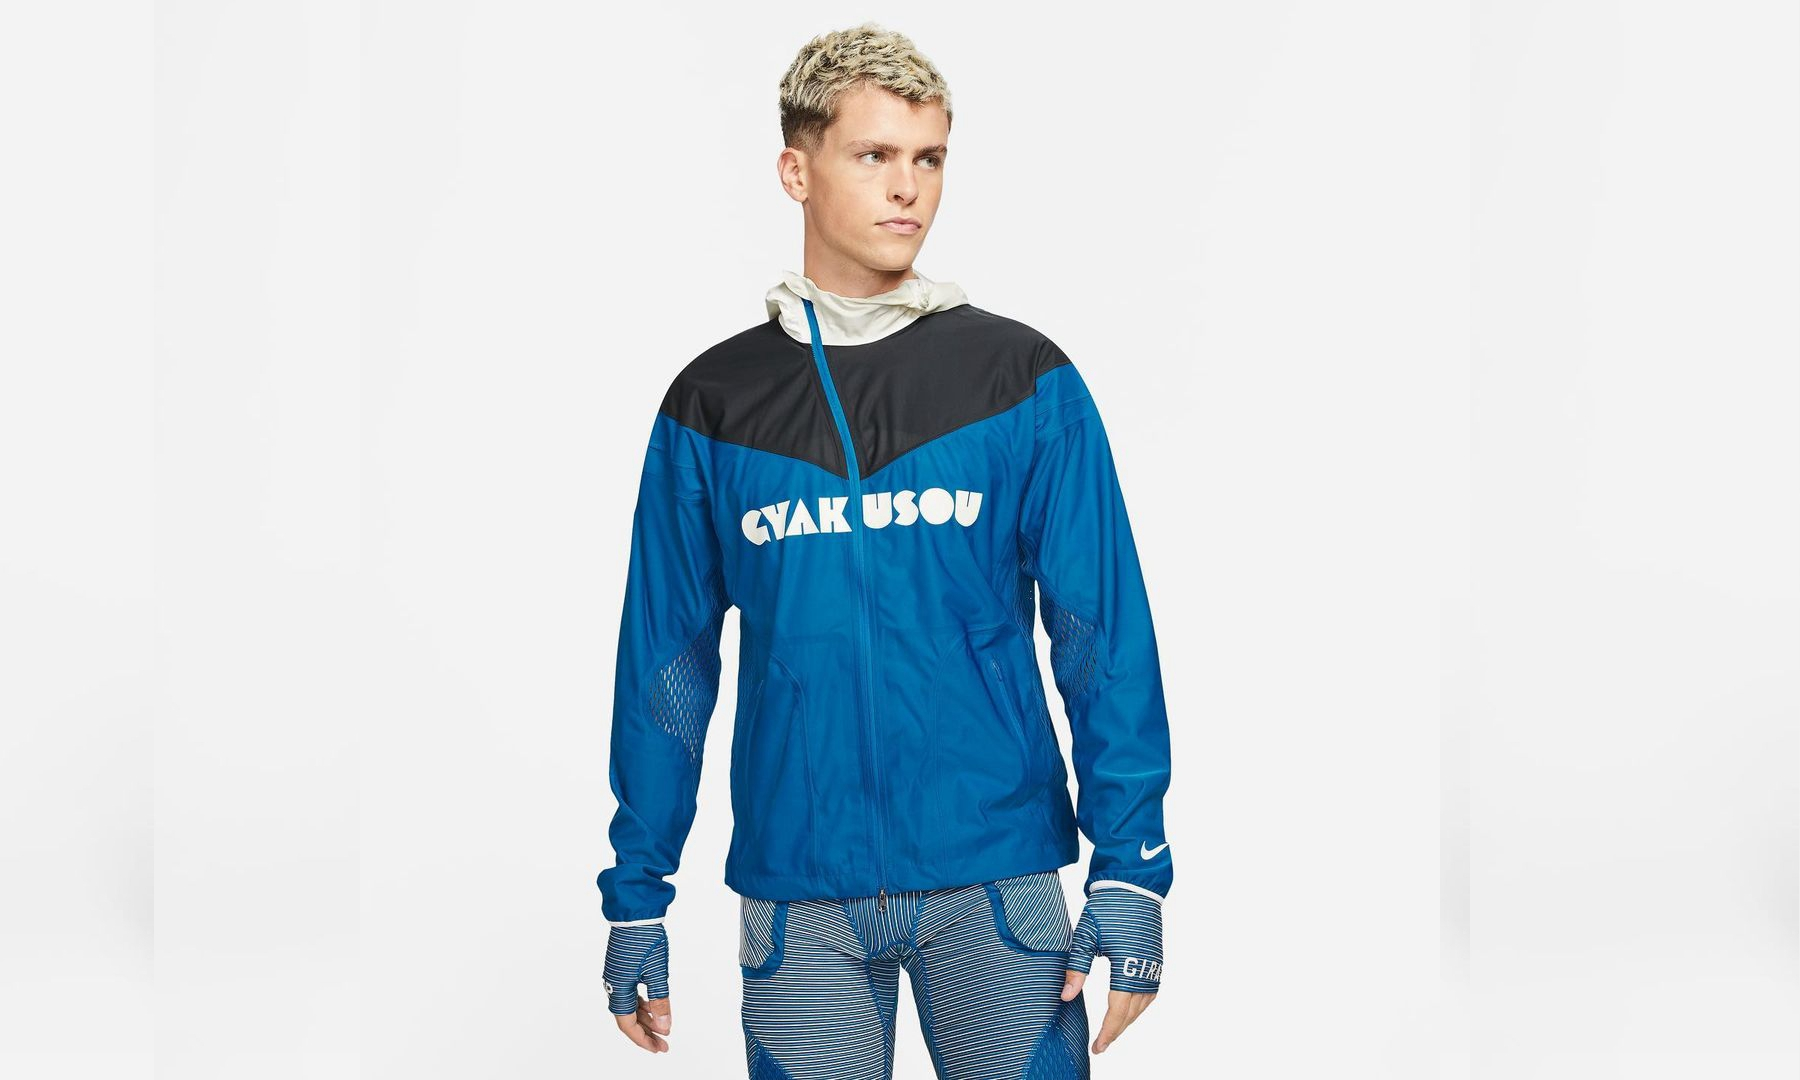 UNDERCOVER x NikeLab GYAKUSOU 2021 夏季系列即将登场